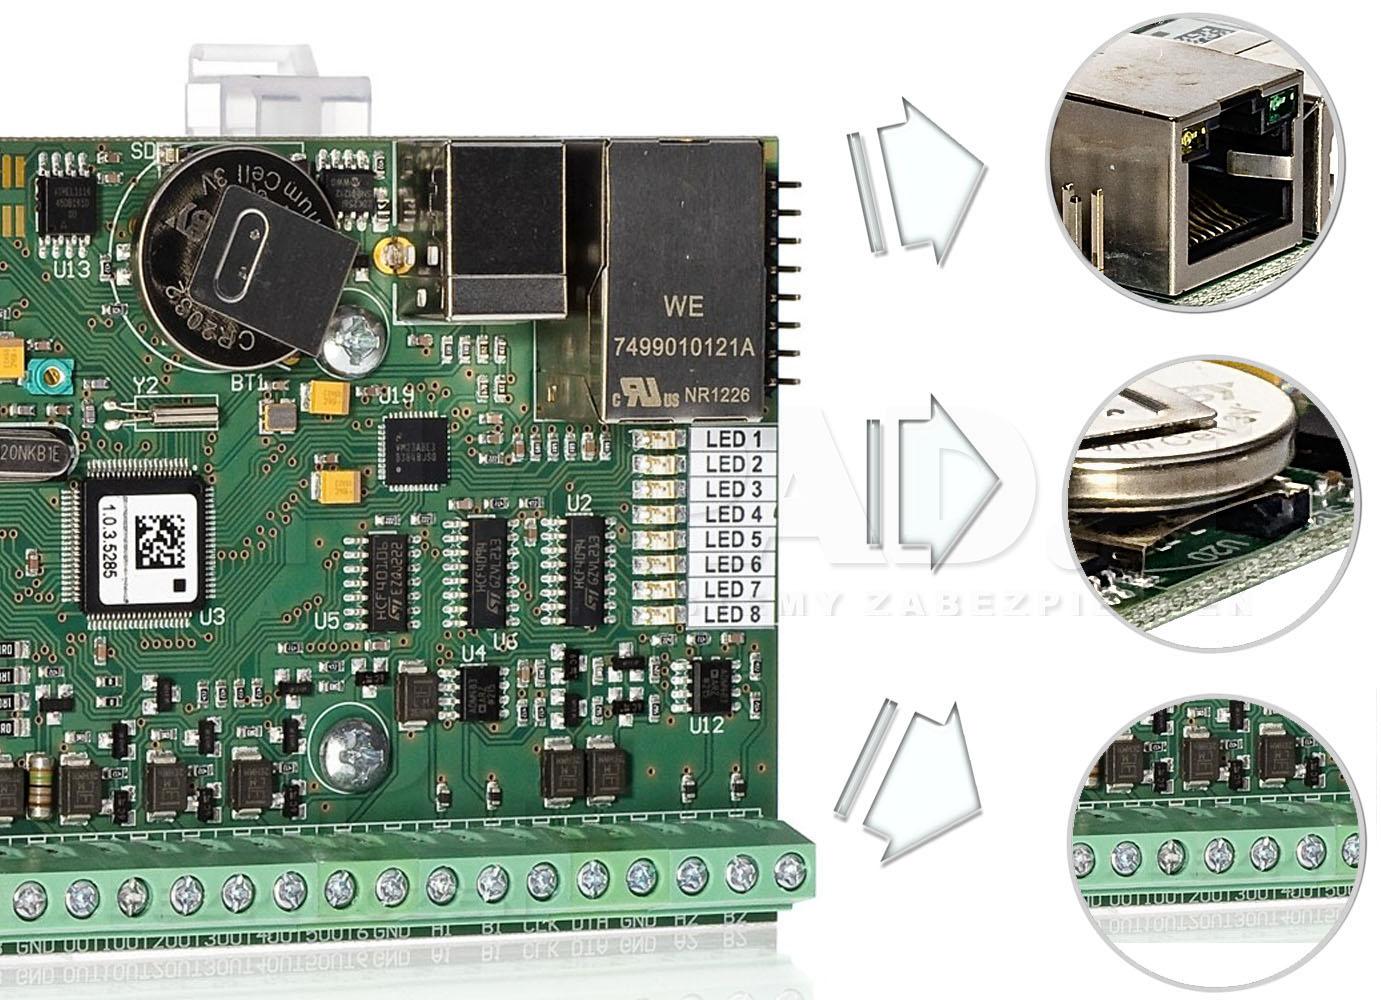 MC16 - Wybrane elementy kontrolera.